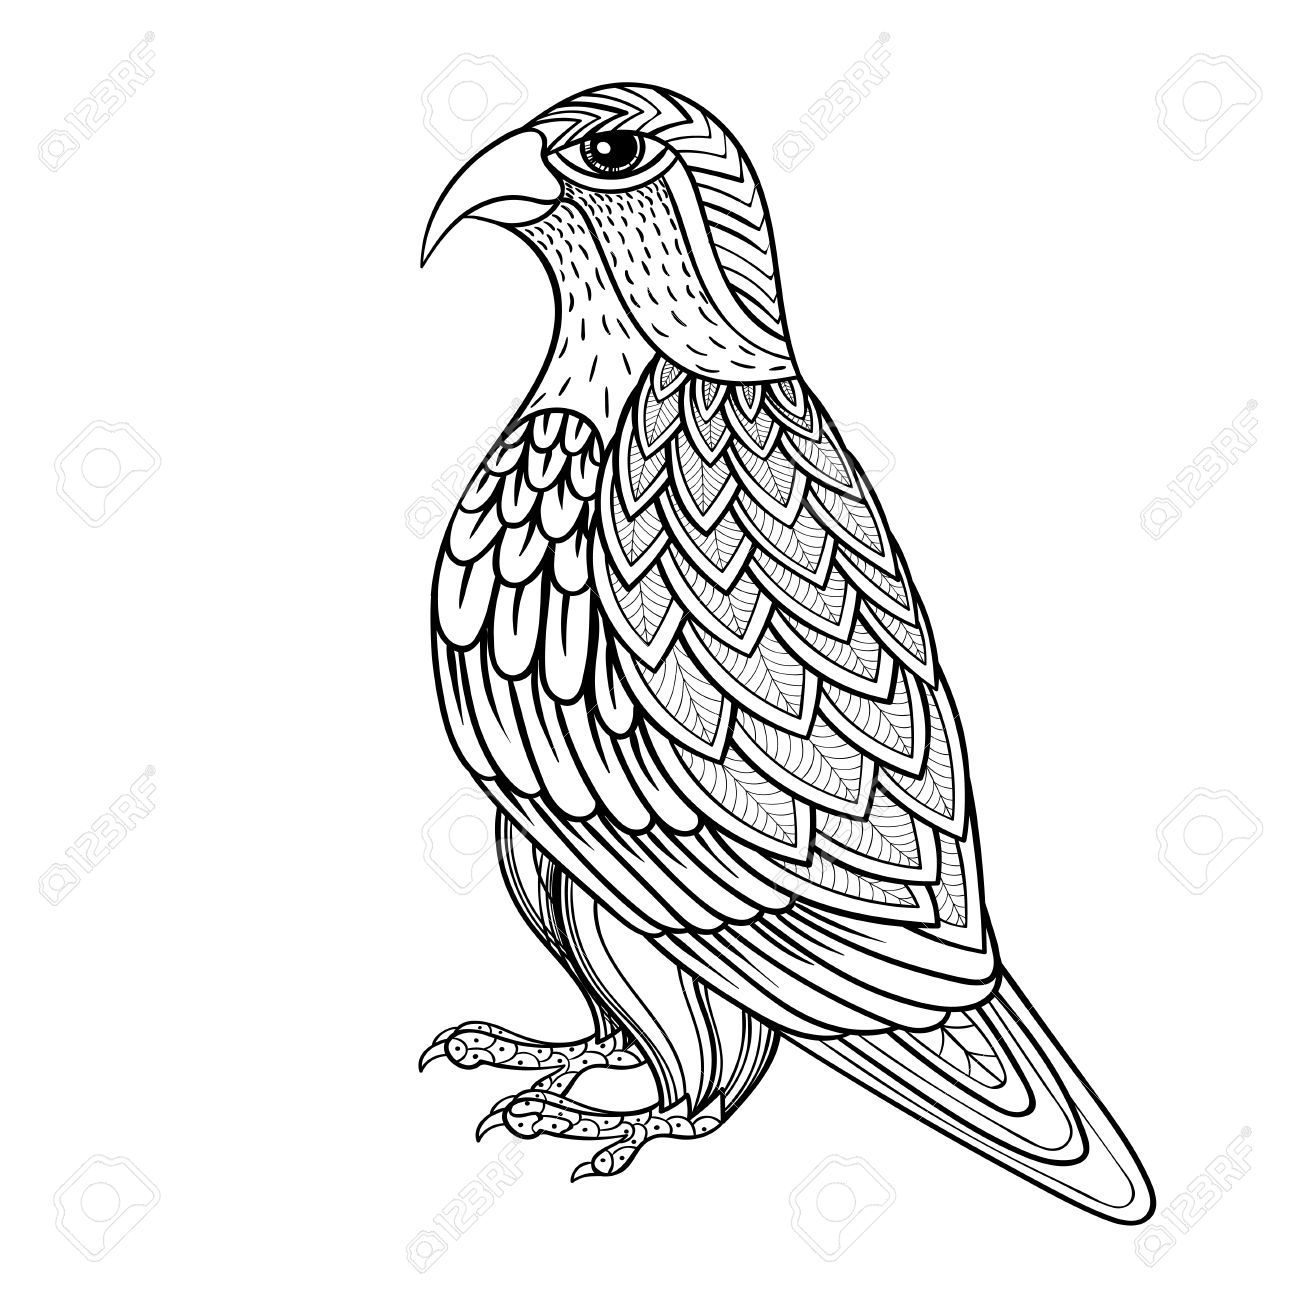 1300x1300 Zentangle Vector Falcon, Bird Hawk Of Prey, Predatory For Adult